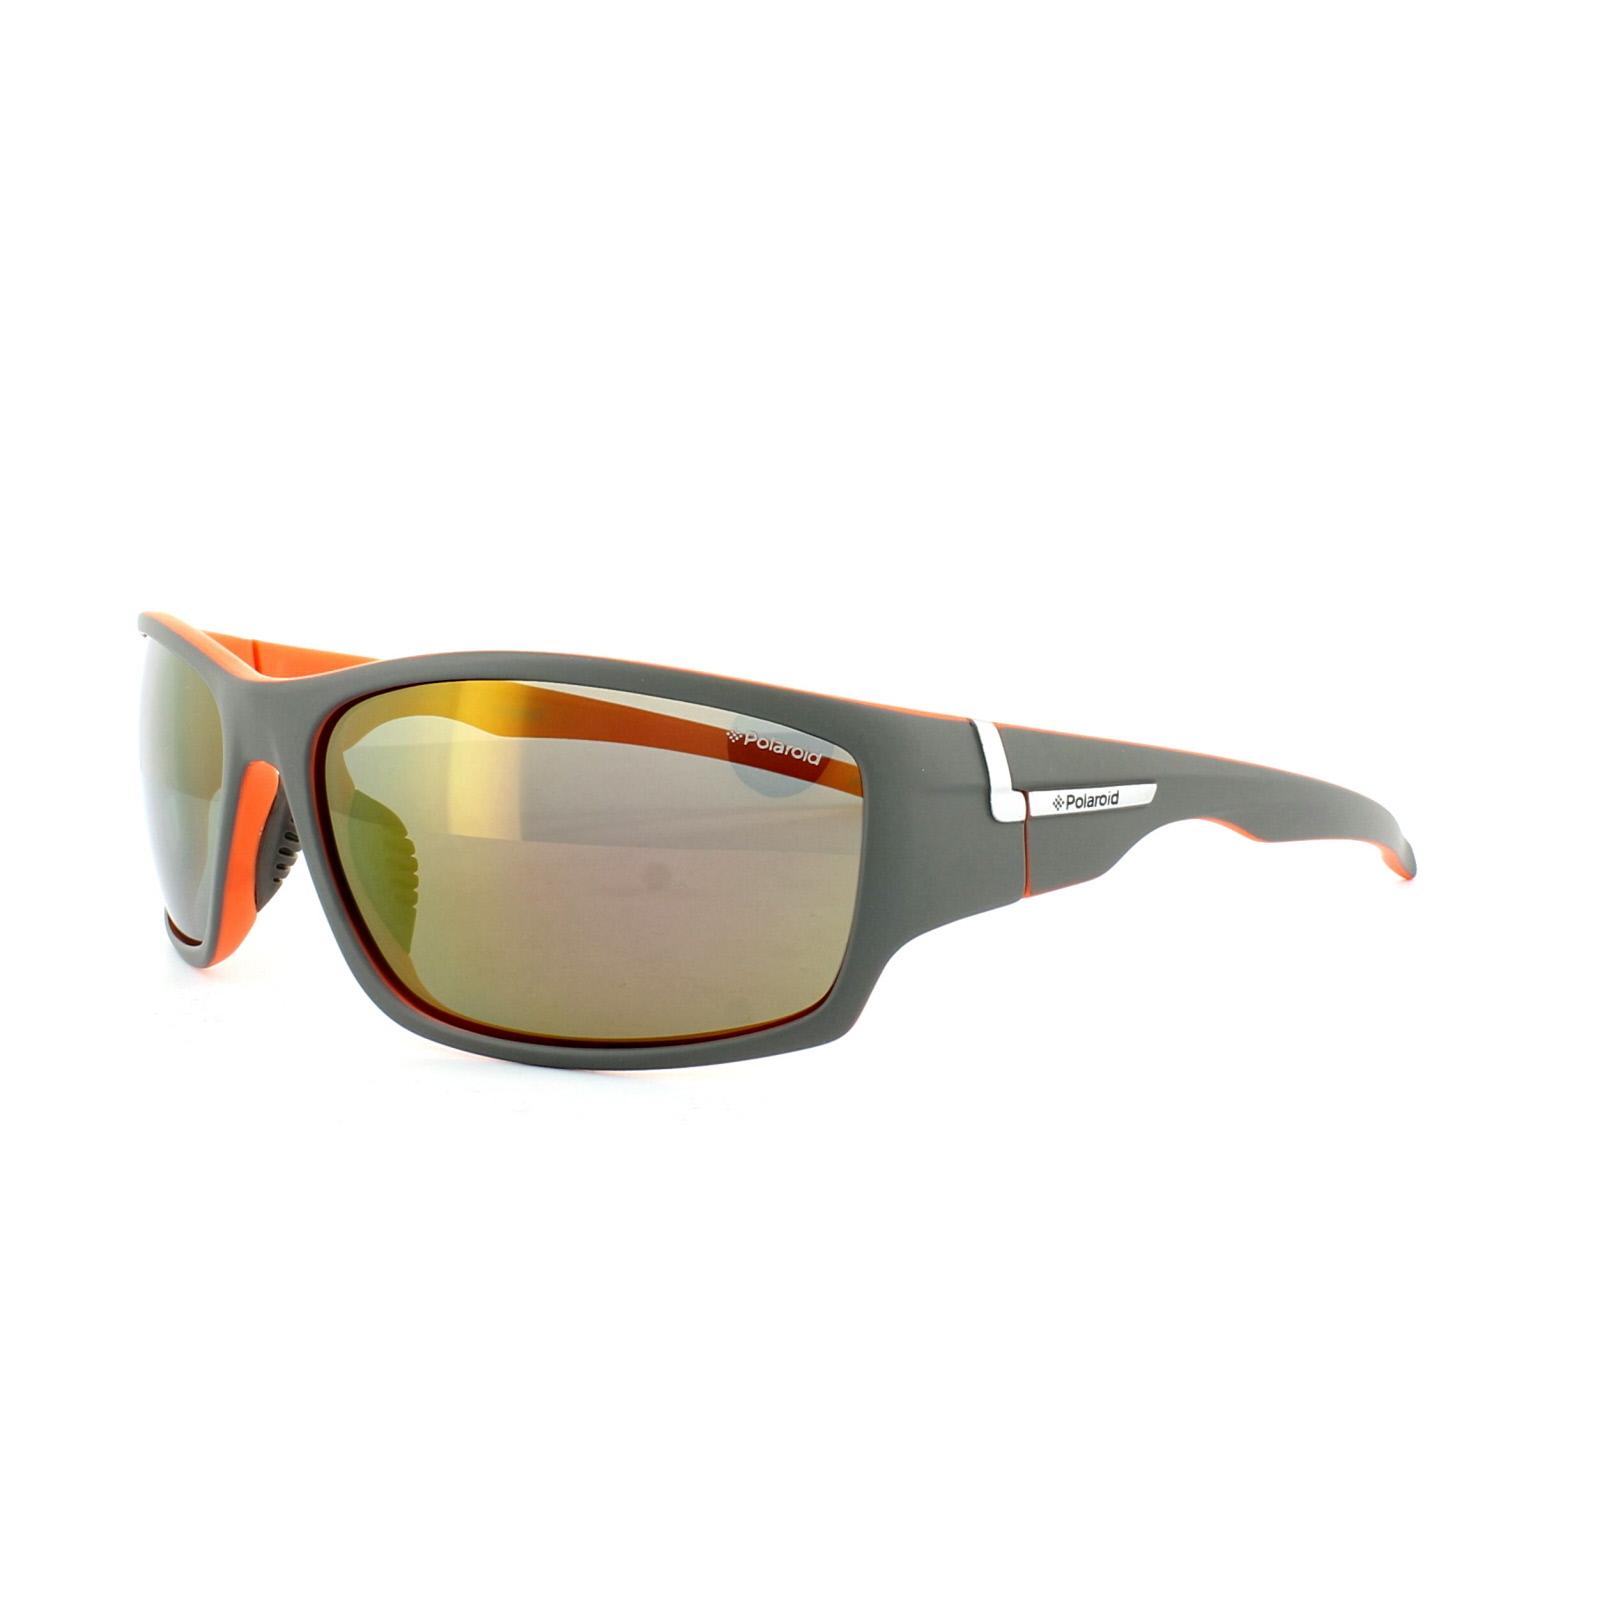 Polaroid Sport Sonnenbrille P7407 OGI JB Grau Grau Spiegel Polarisiert 7nO3pPQP